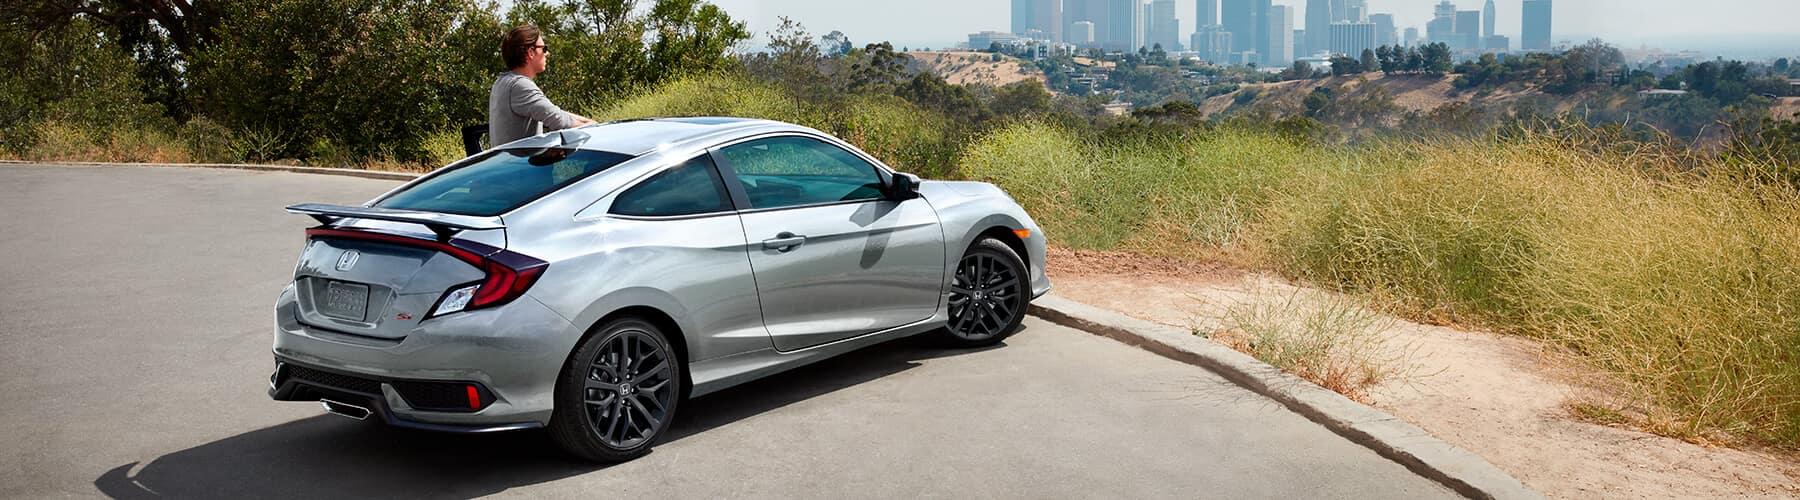 2020 Honda Civic Si Coupe Slider